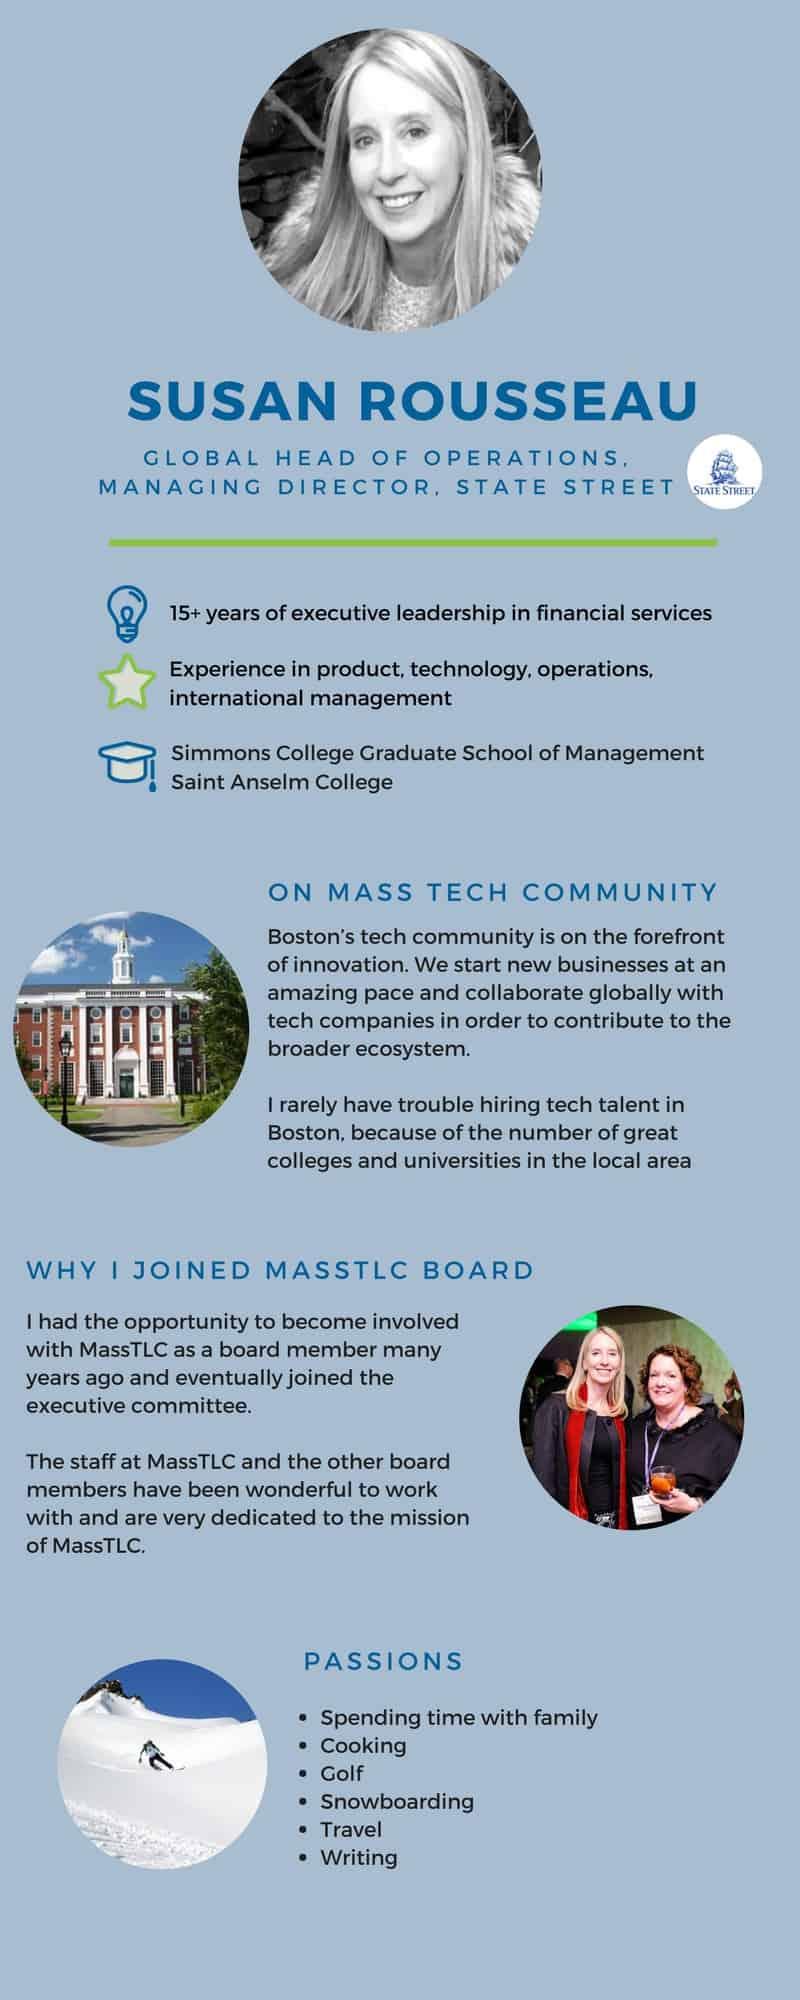 MassTLC Trustee Susan Rousseau